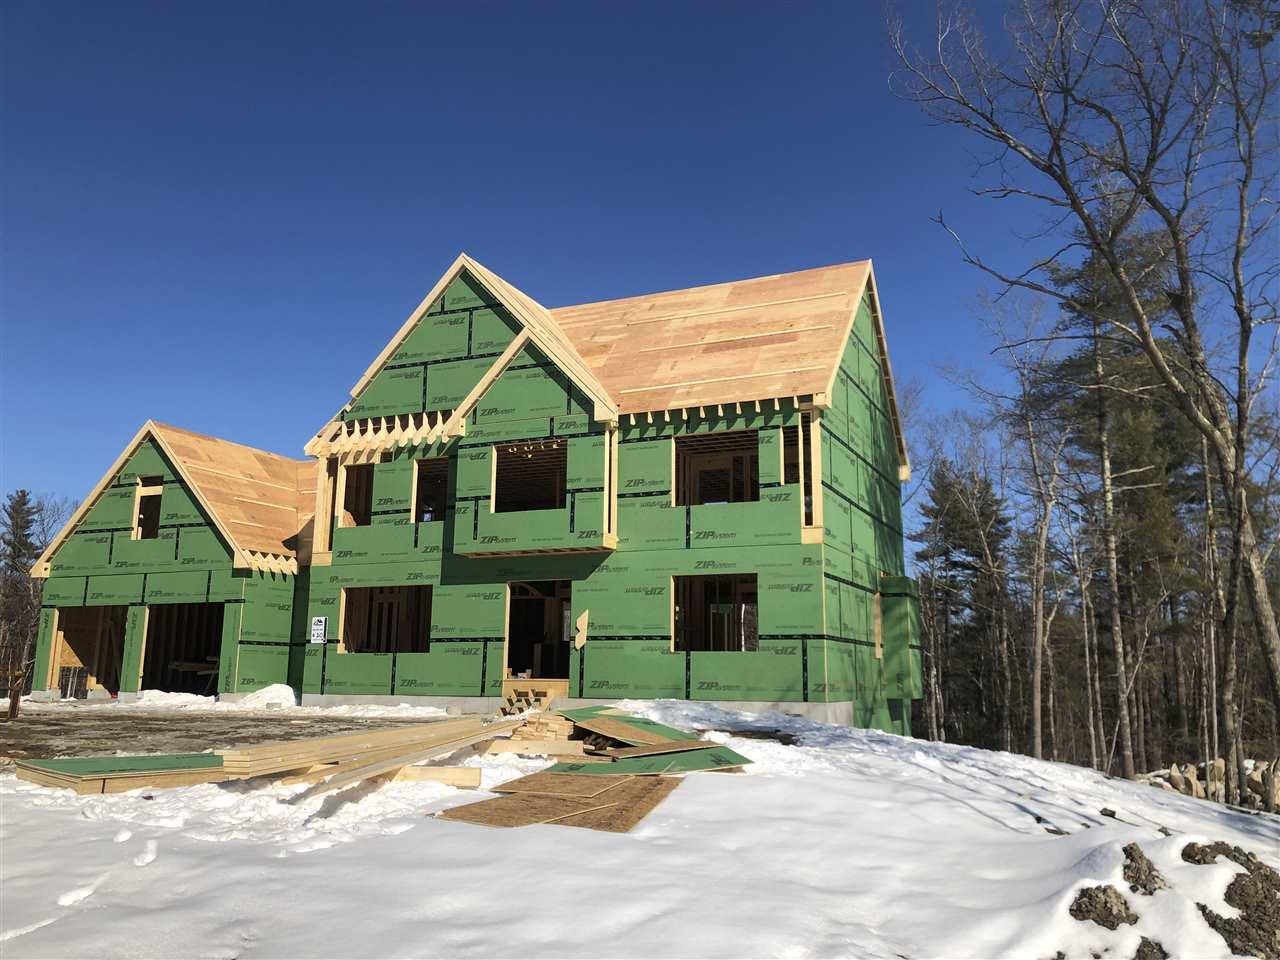 Photo of 10 Timber Woods Drive Salem NH 03079